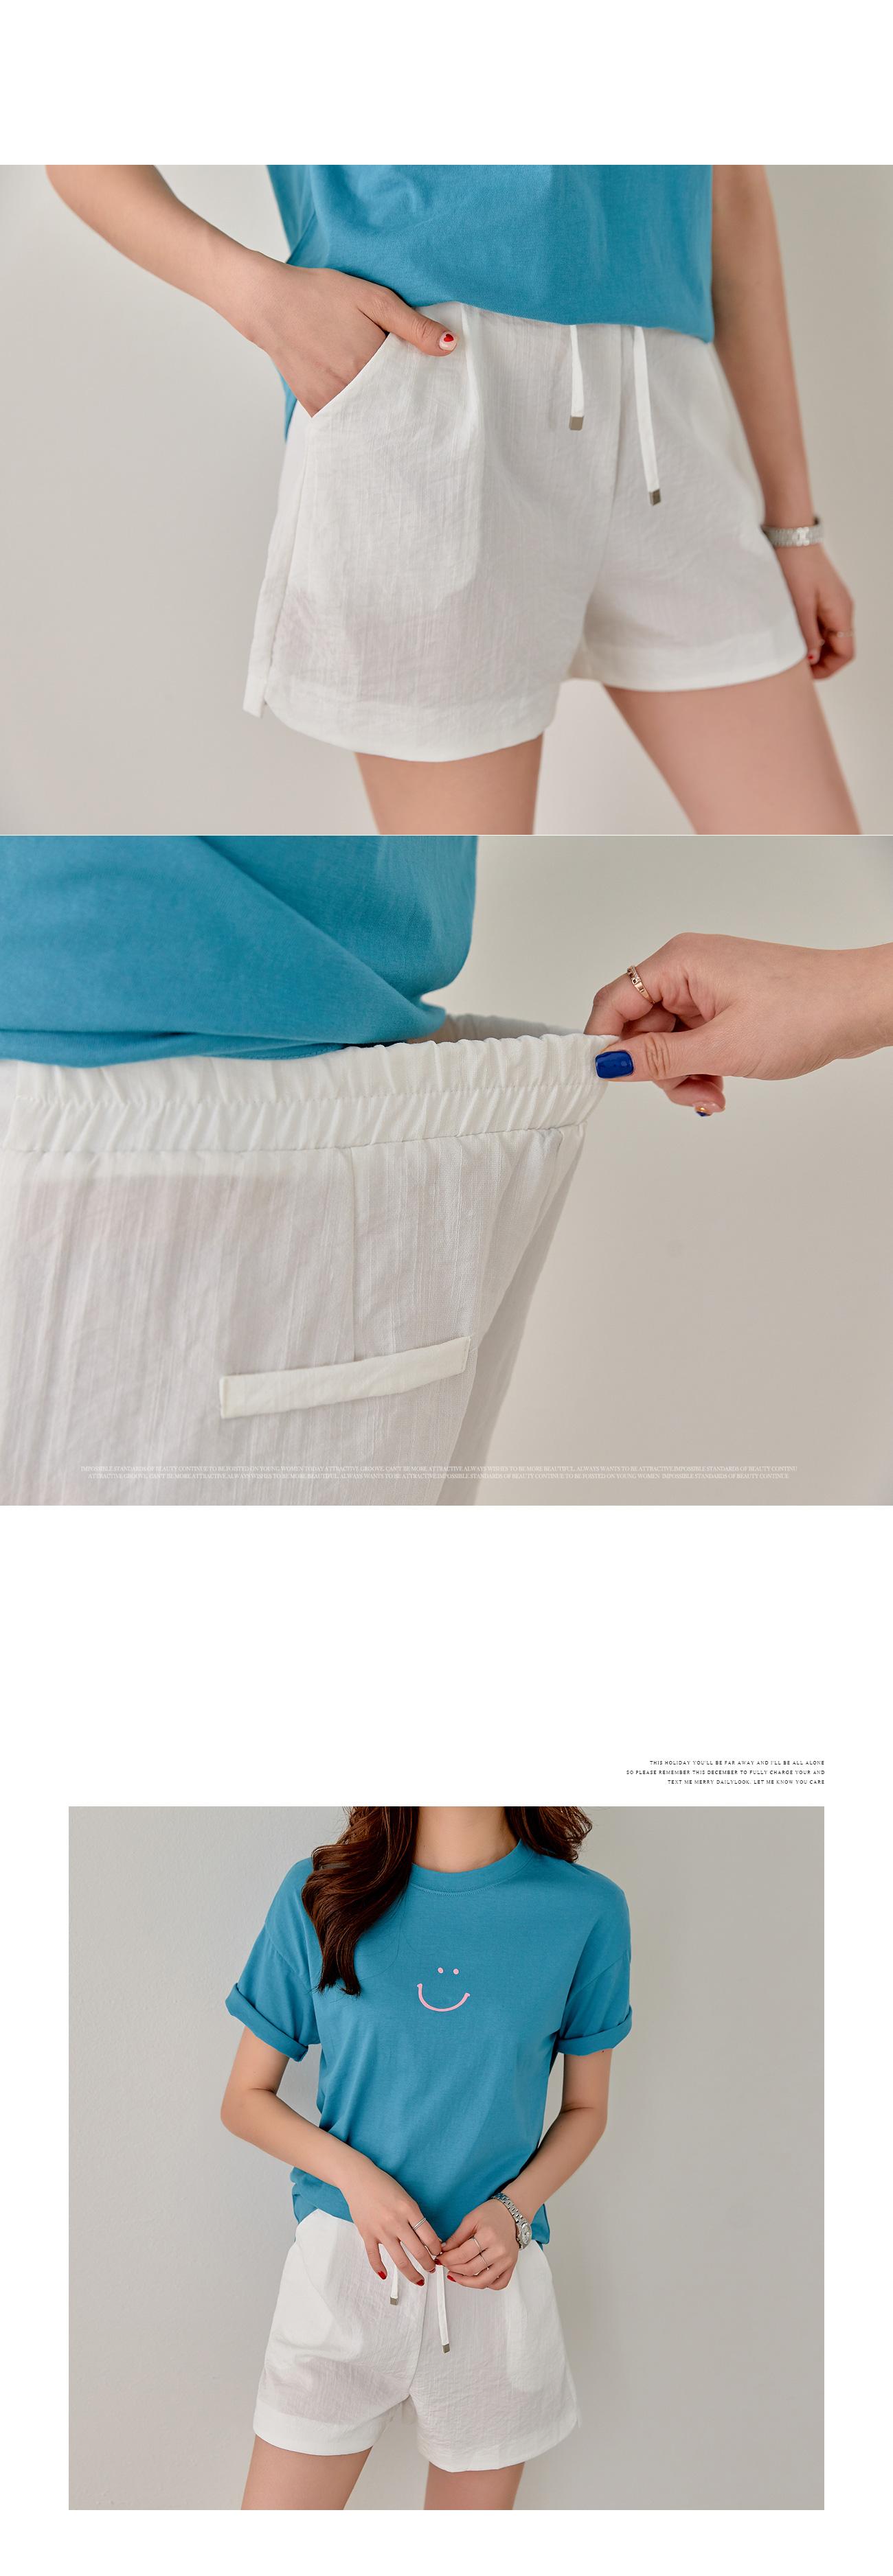 Ribbon strap banding cotton shorts #75325